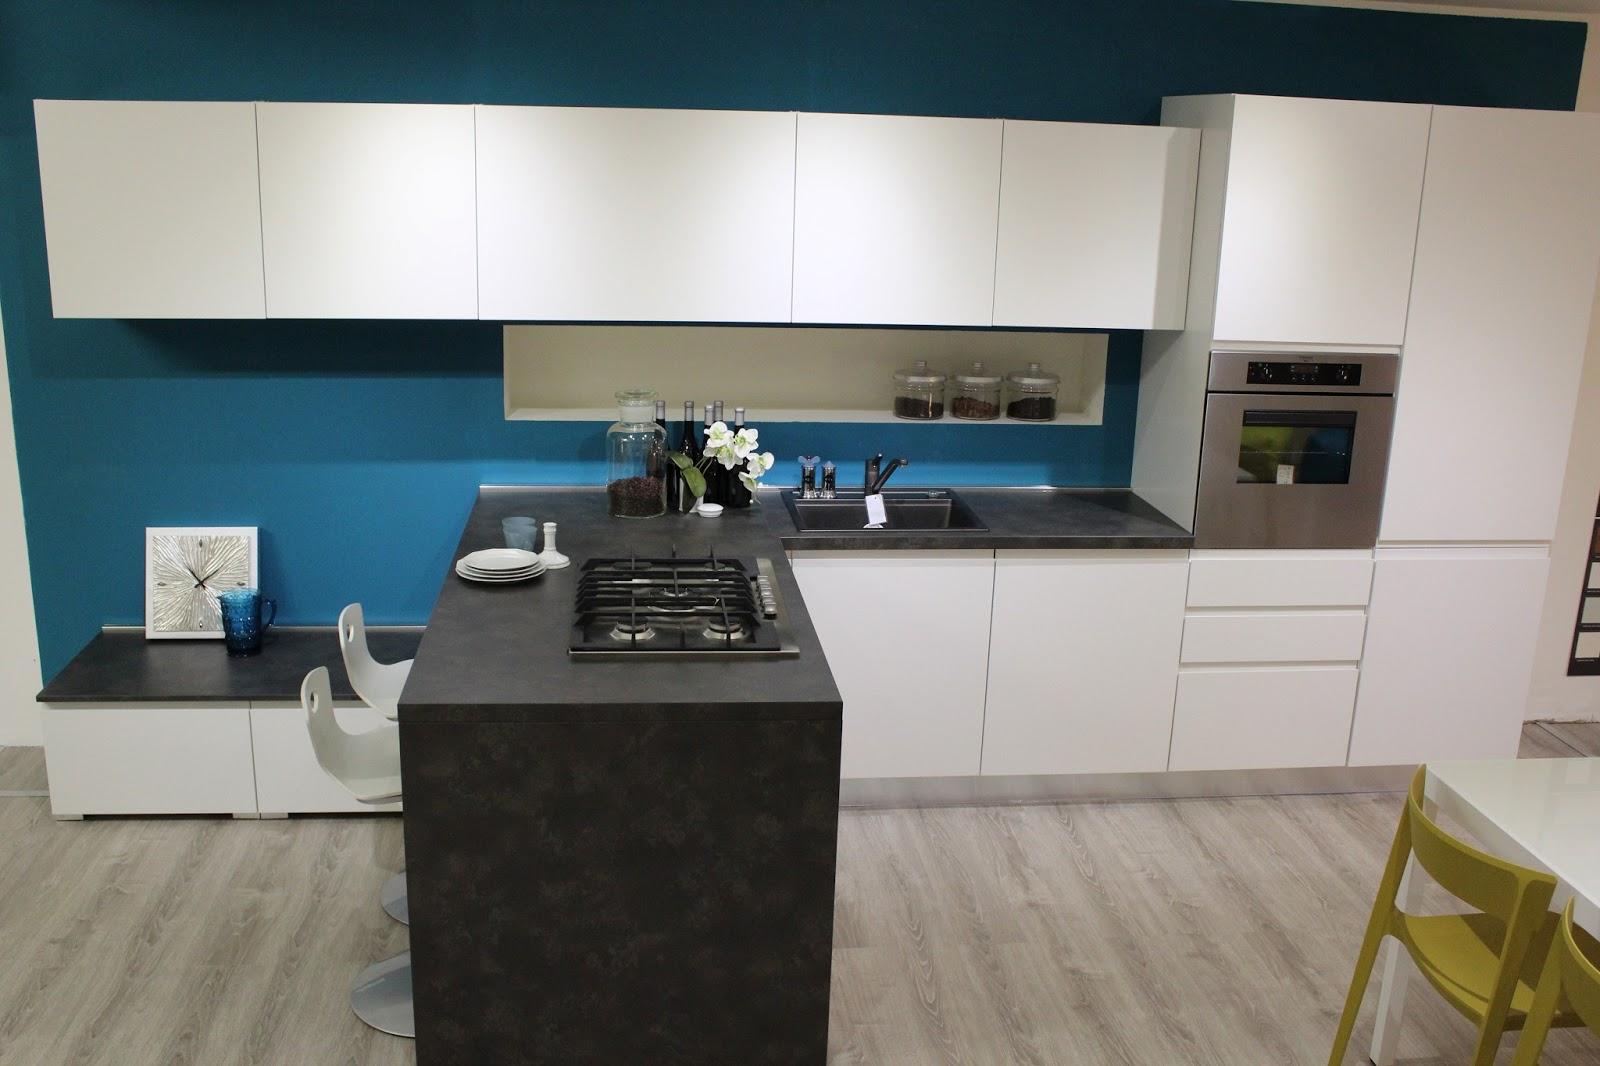 Cucine Arrex. Nuovi spazi, nuove idee! | Eurom Arredamenti il Blog